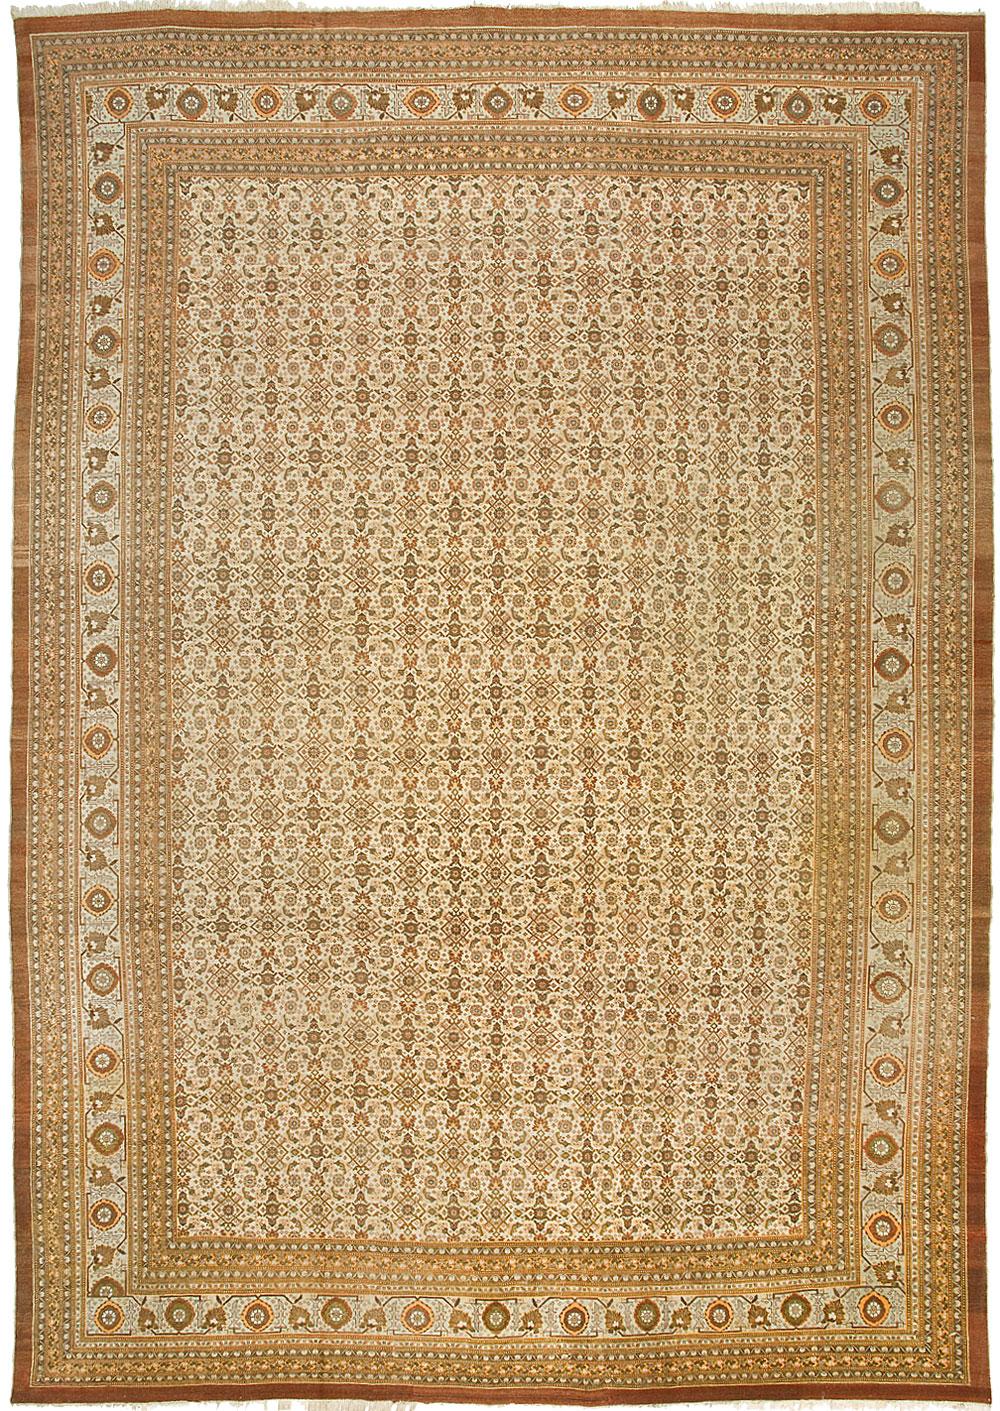 Tabriz Carpet_17351